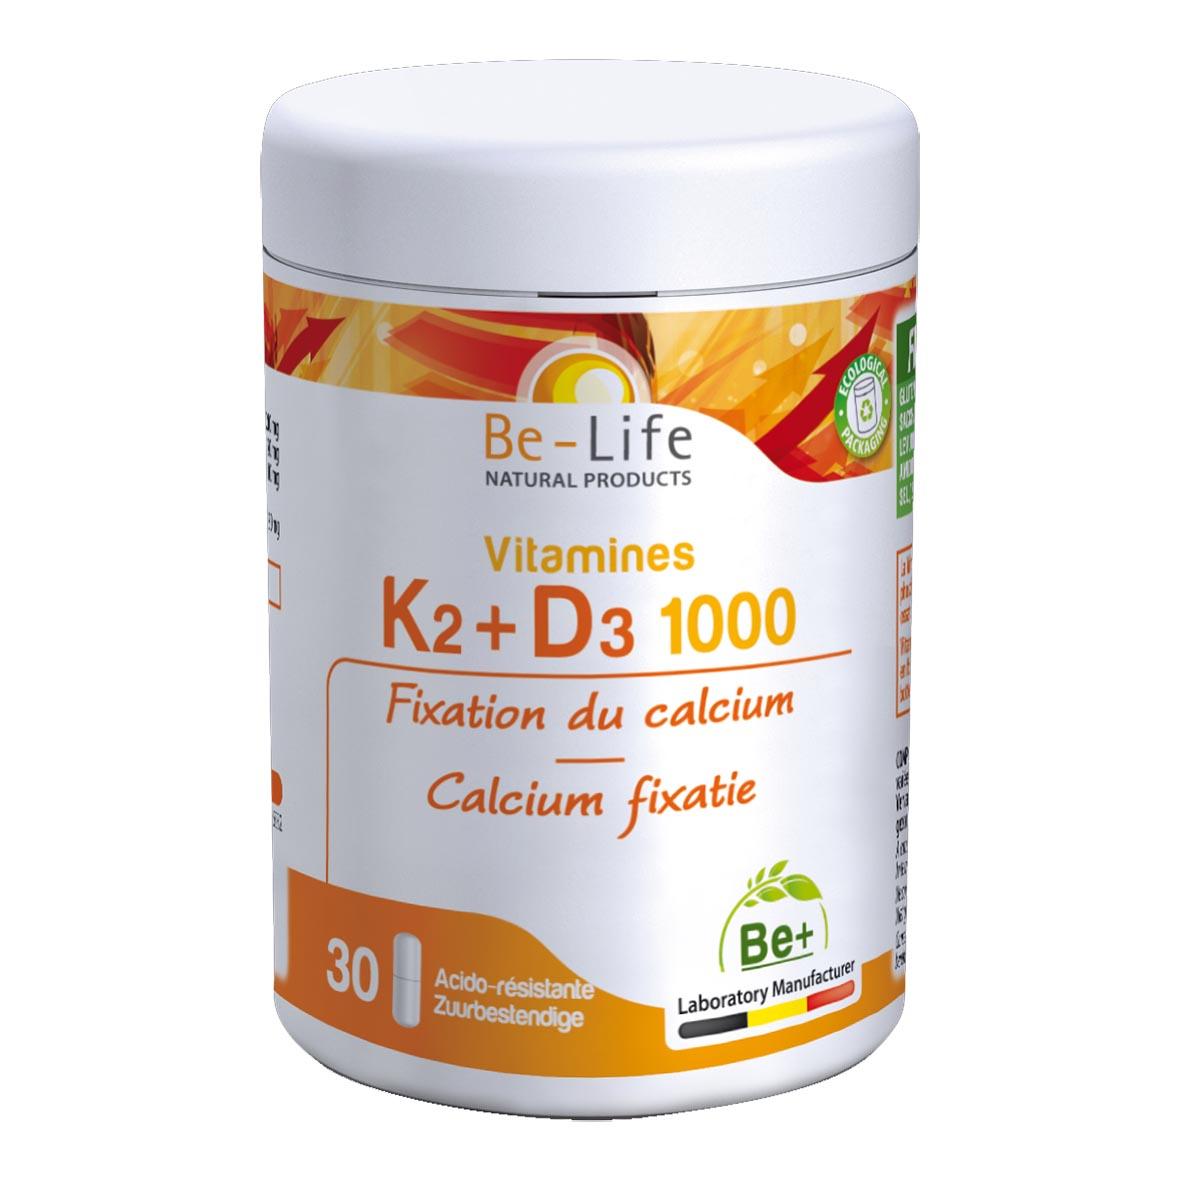 Vitamine K2-D3 1000 30 gélules